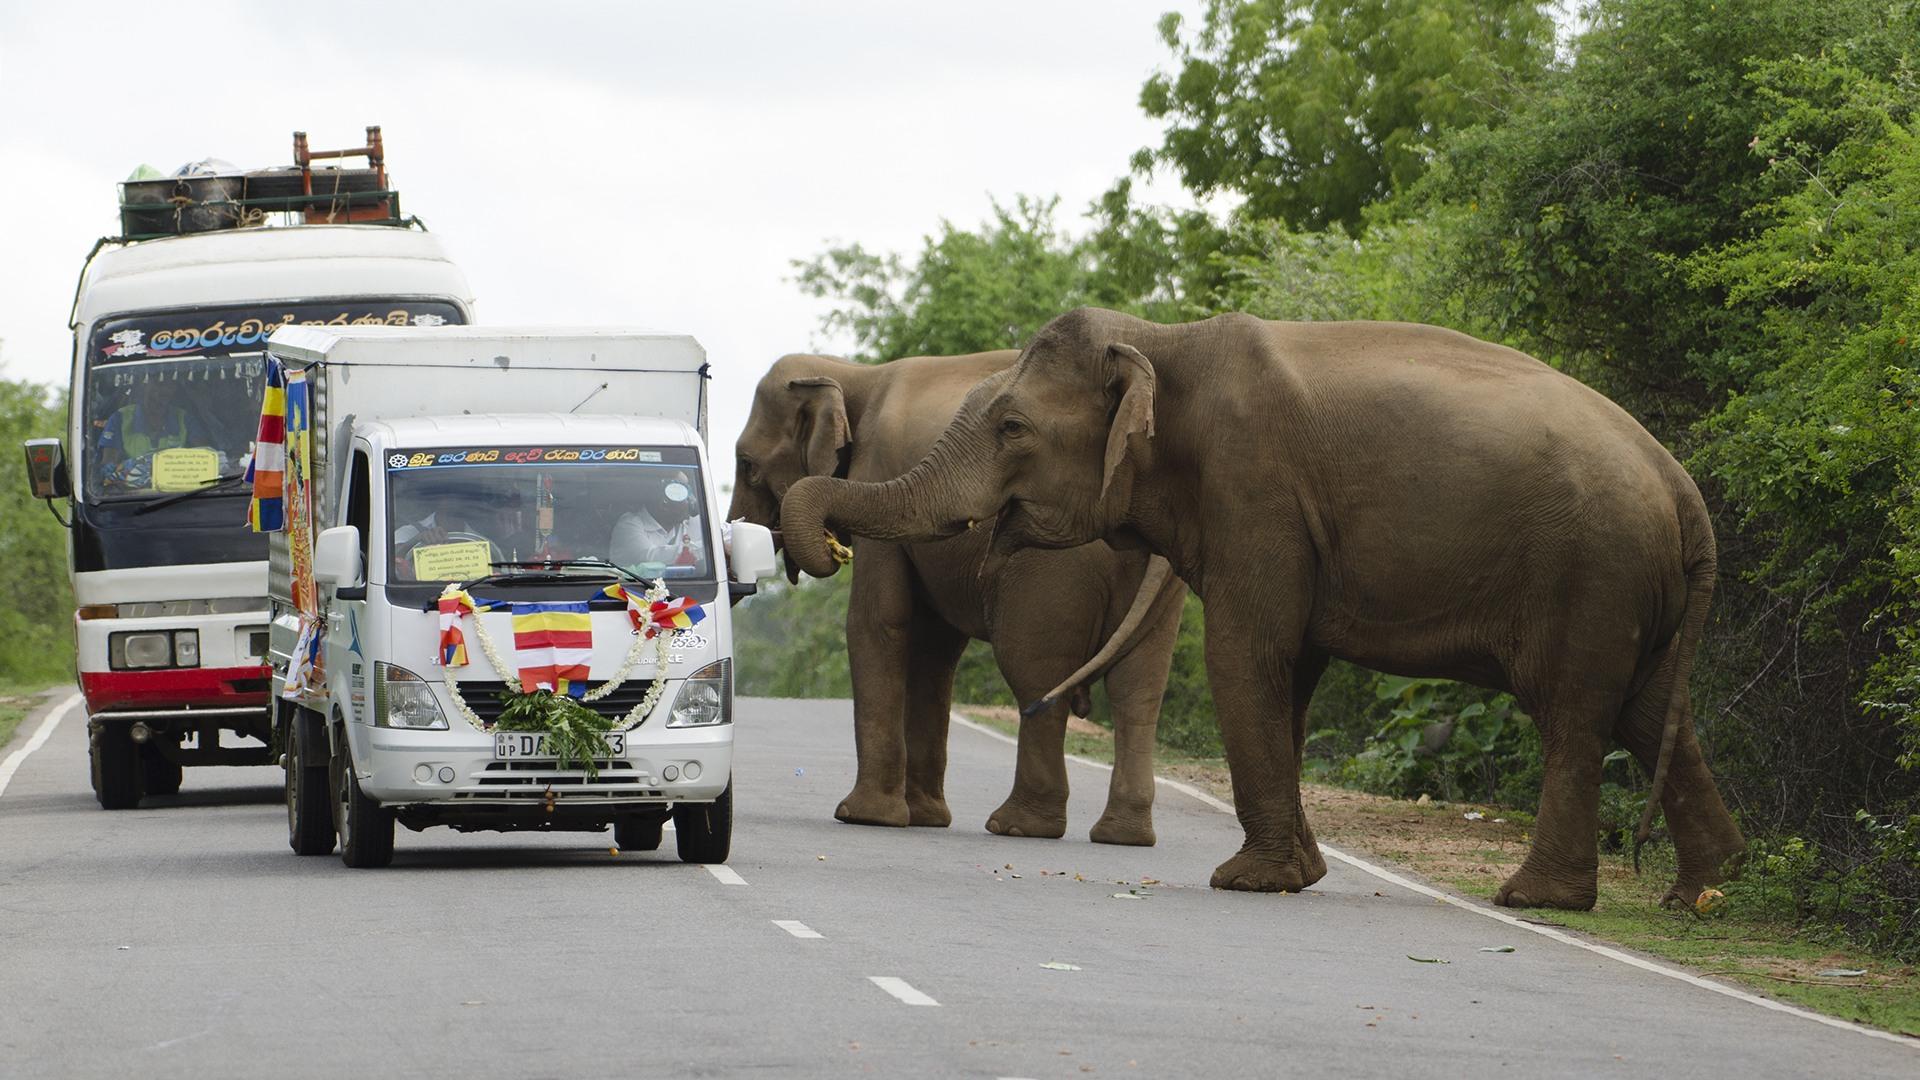 Problem Elephant or Elephantine Problem?